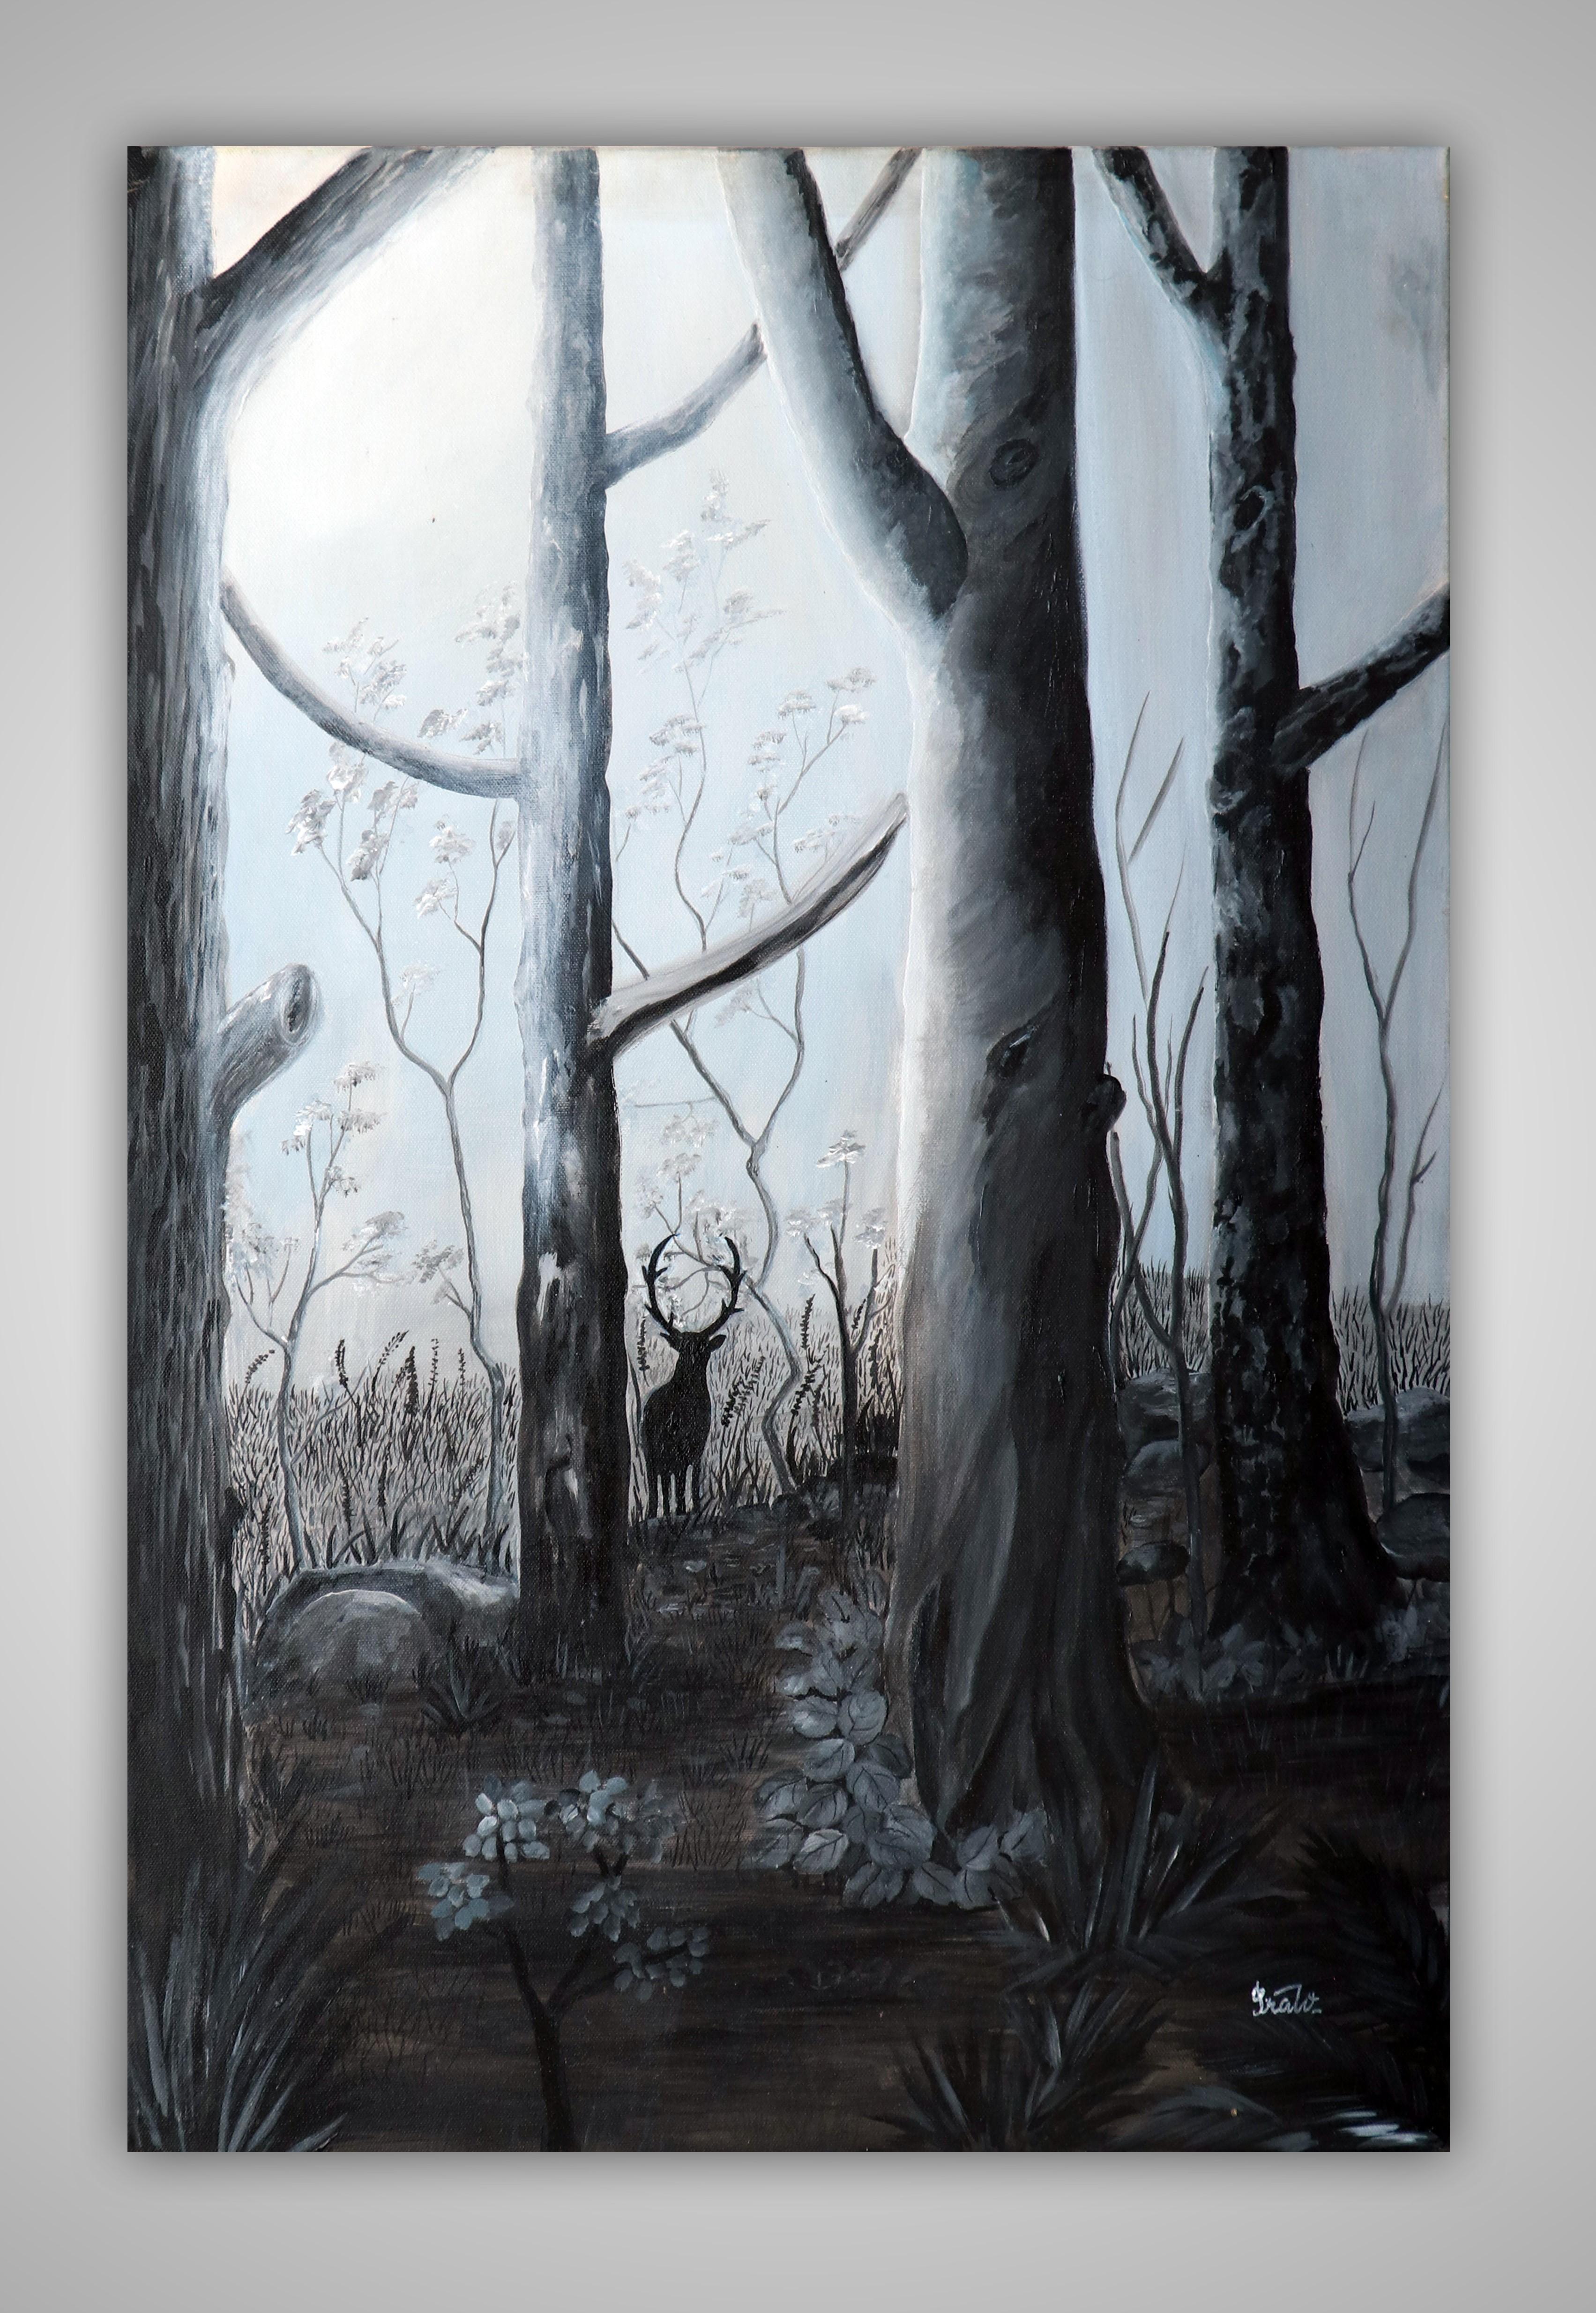 Hark, its the night of the wild by Iranganie Wickramasinghe